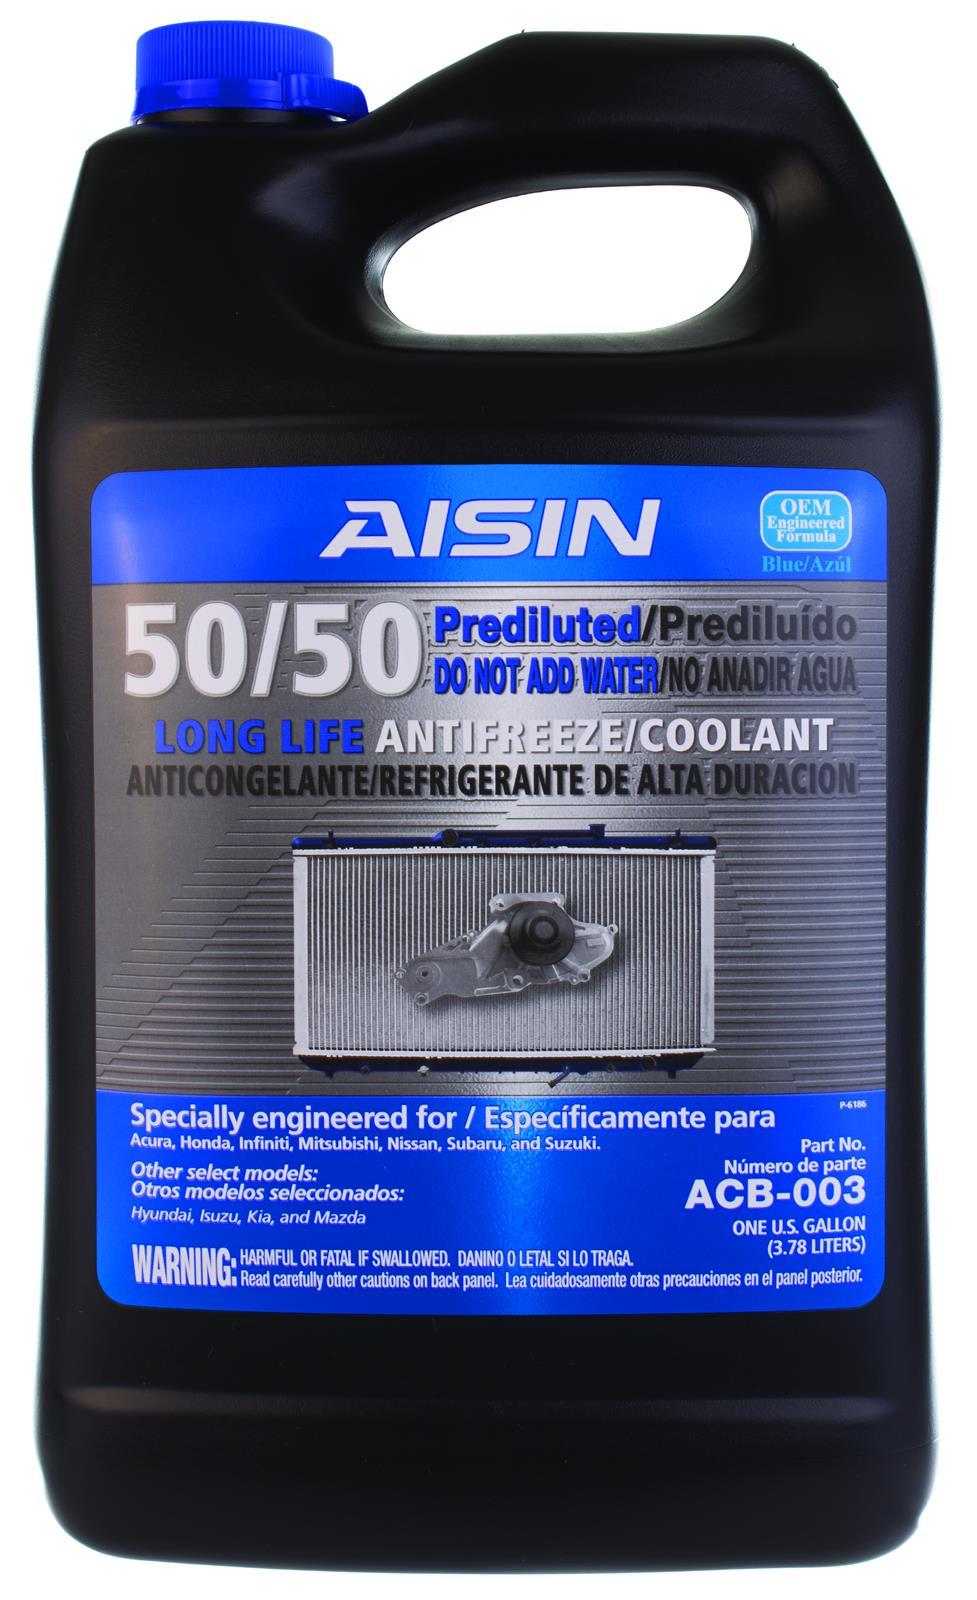 genuine nissan long life antifreeze/coolant (blue) or equivalent